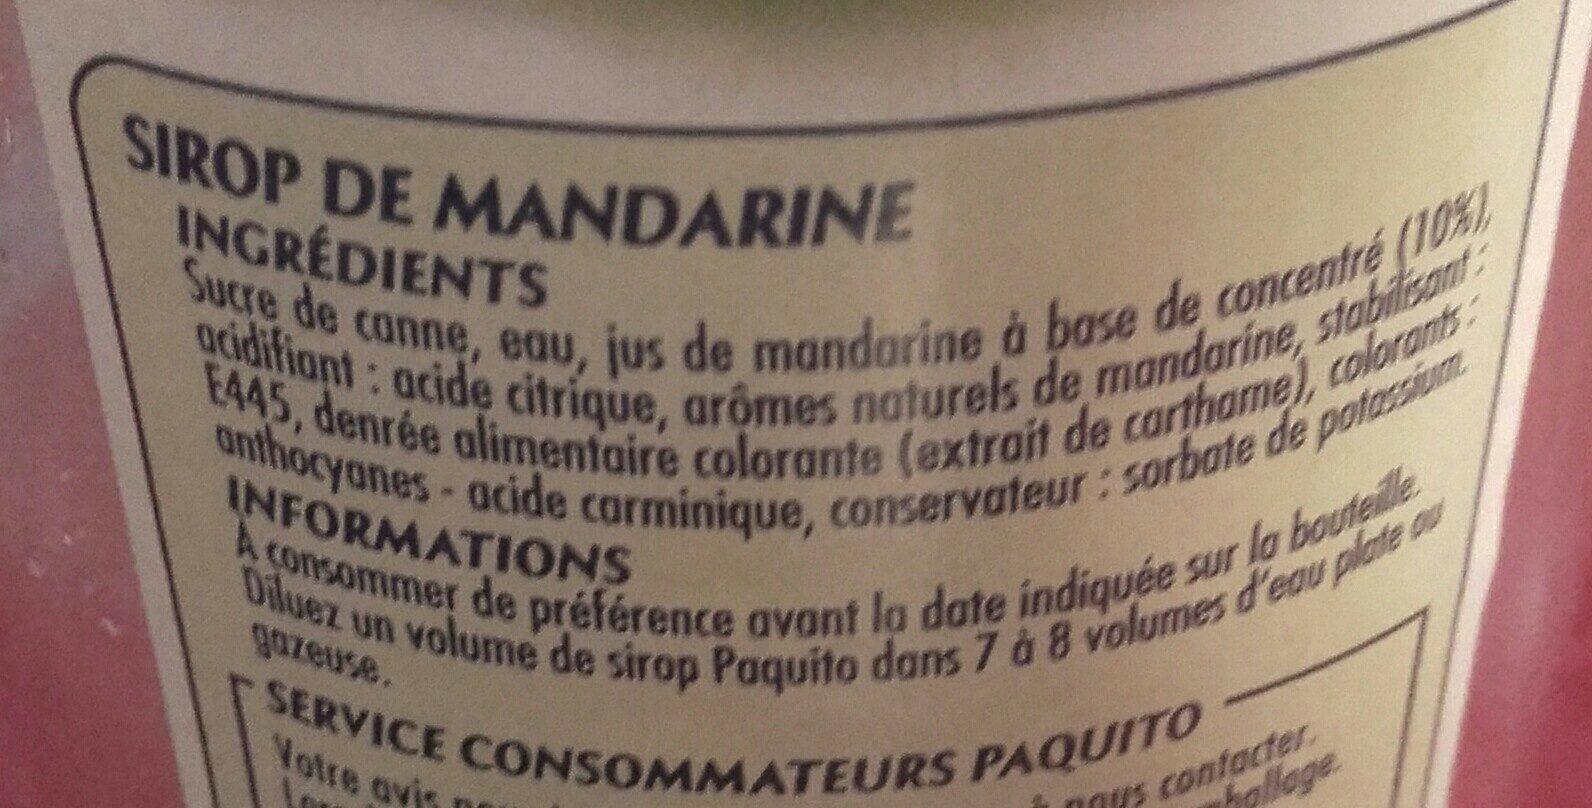 Sirop de mandarine - Ingrediënten